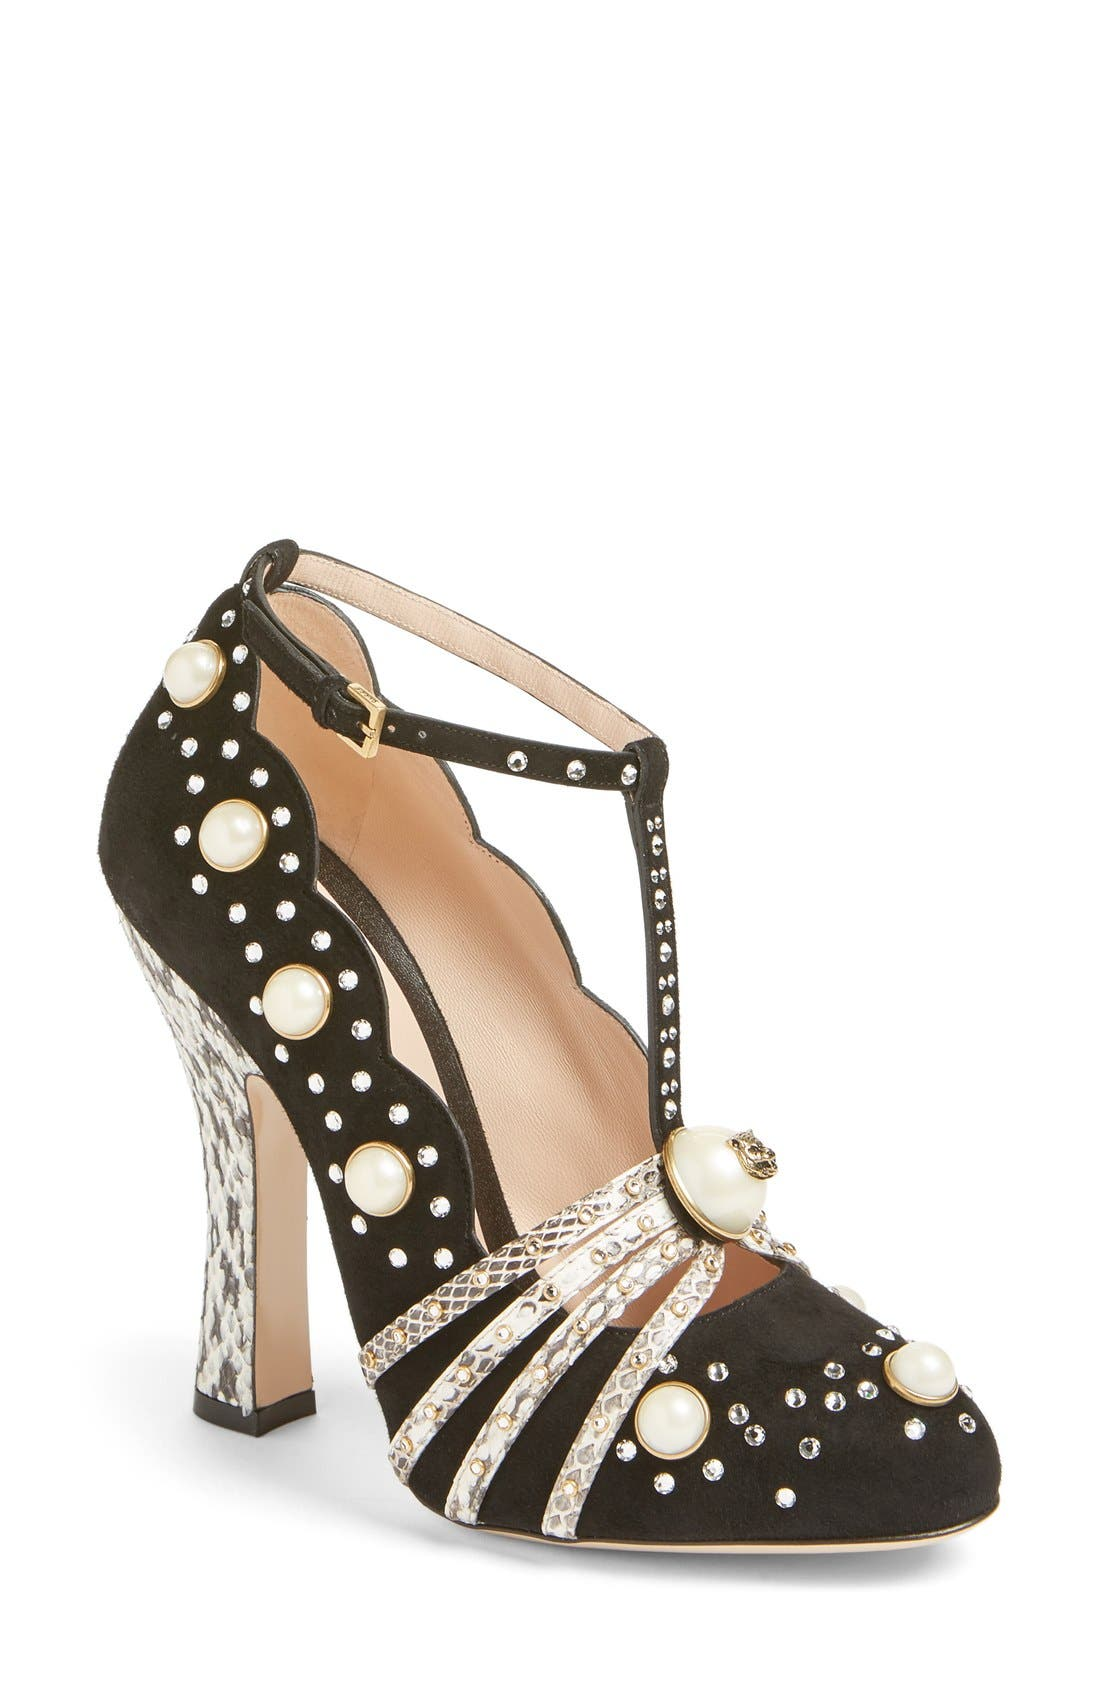 Gucci Ofelia Pearly Crystal Embellished Pump (Women)